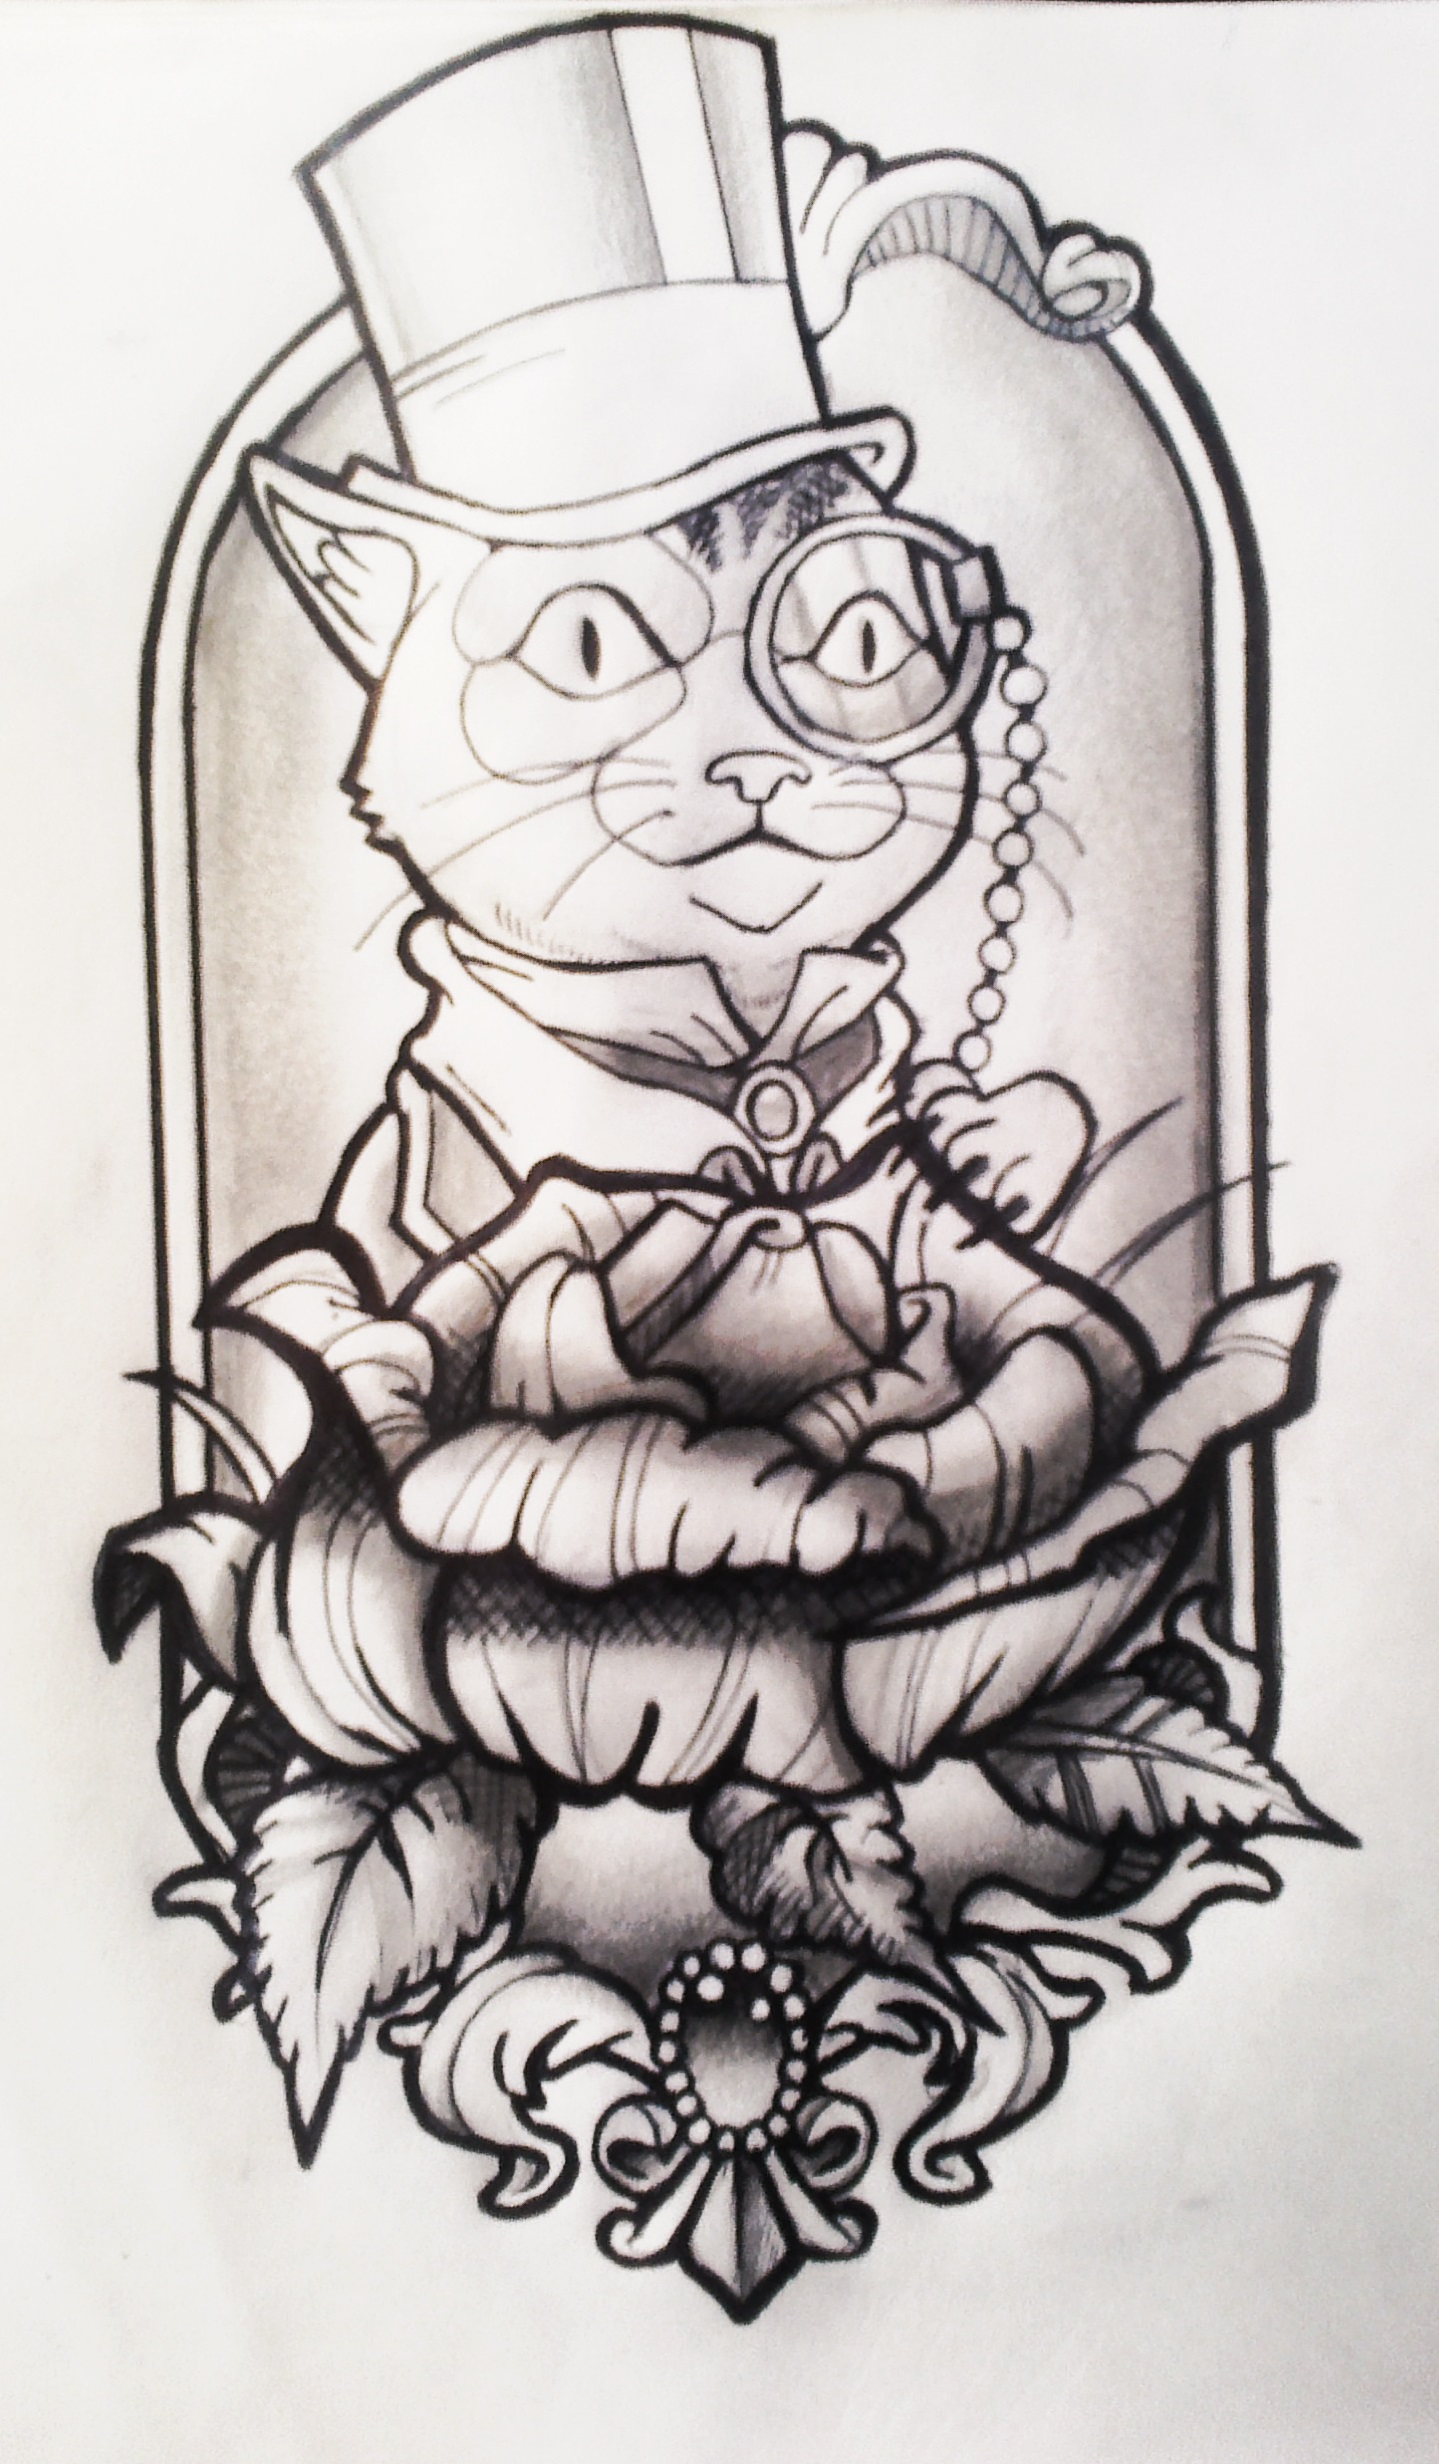 Dressed Cat Neotraditional Tattoo Design By Fabian Alvarez Sosa On